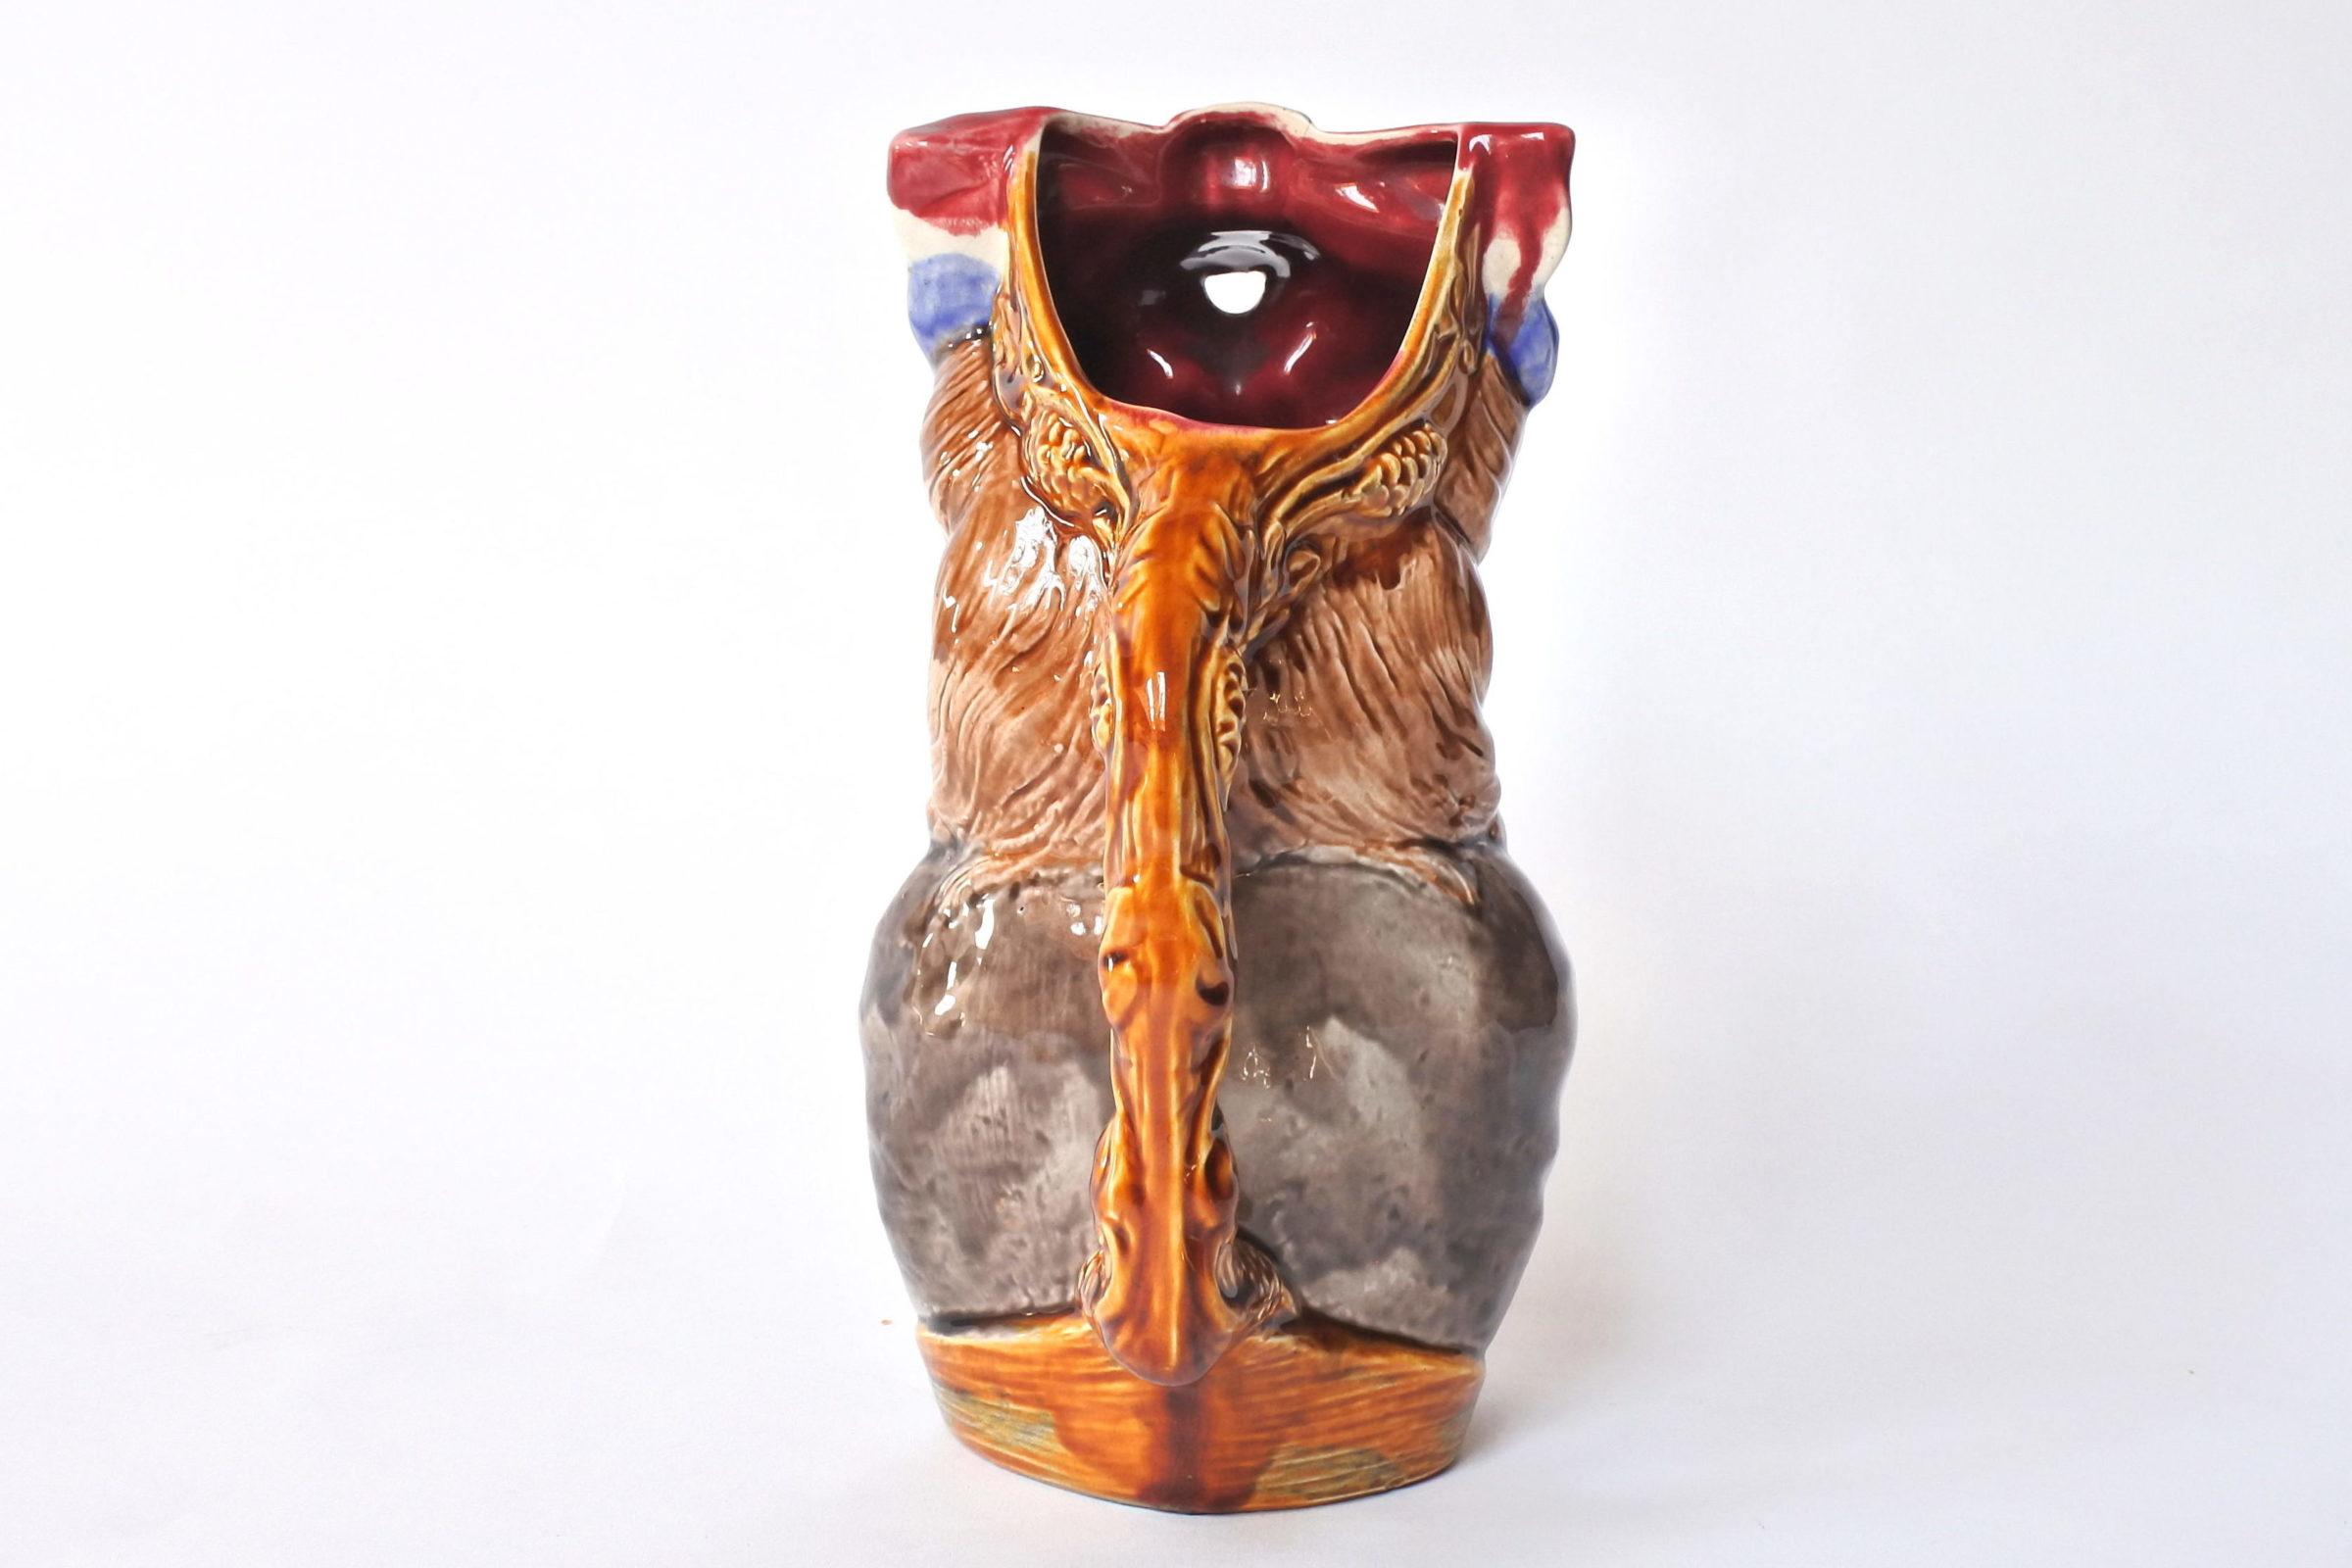 Brocca in ceramica barbotine a forma di volto donna - Onnaing n° 808 - 3